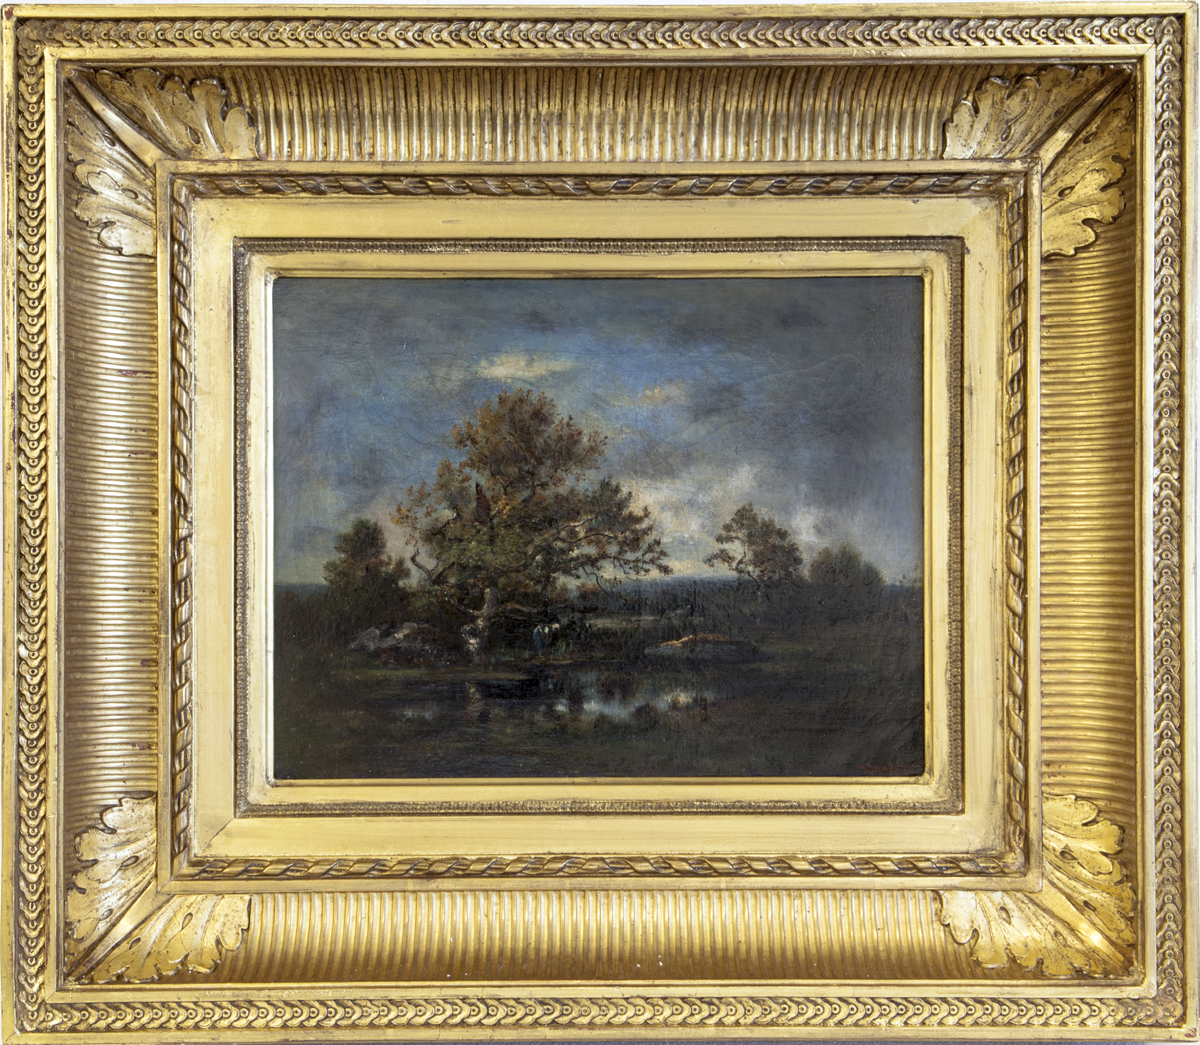 LOT 156 Narcisse Diaz de la Peña, La mare dans la clairière, Original Oil on canvas, 10.7 x 14.6 in.